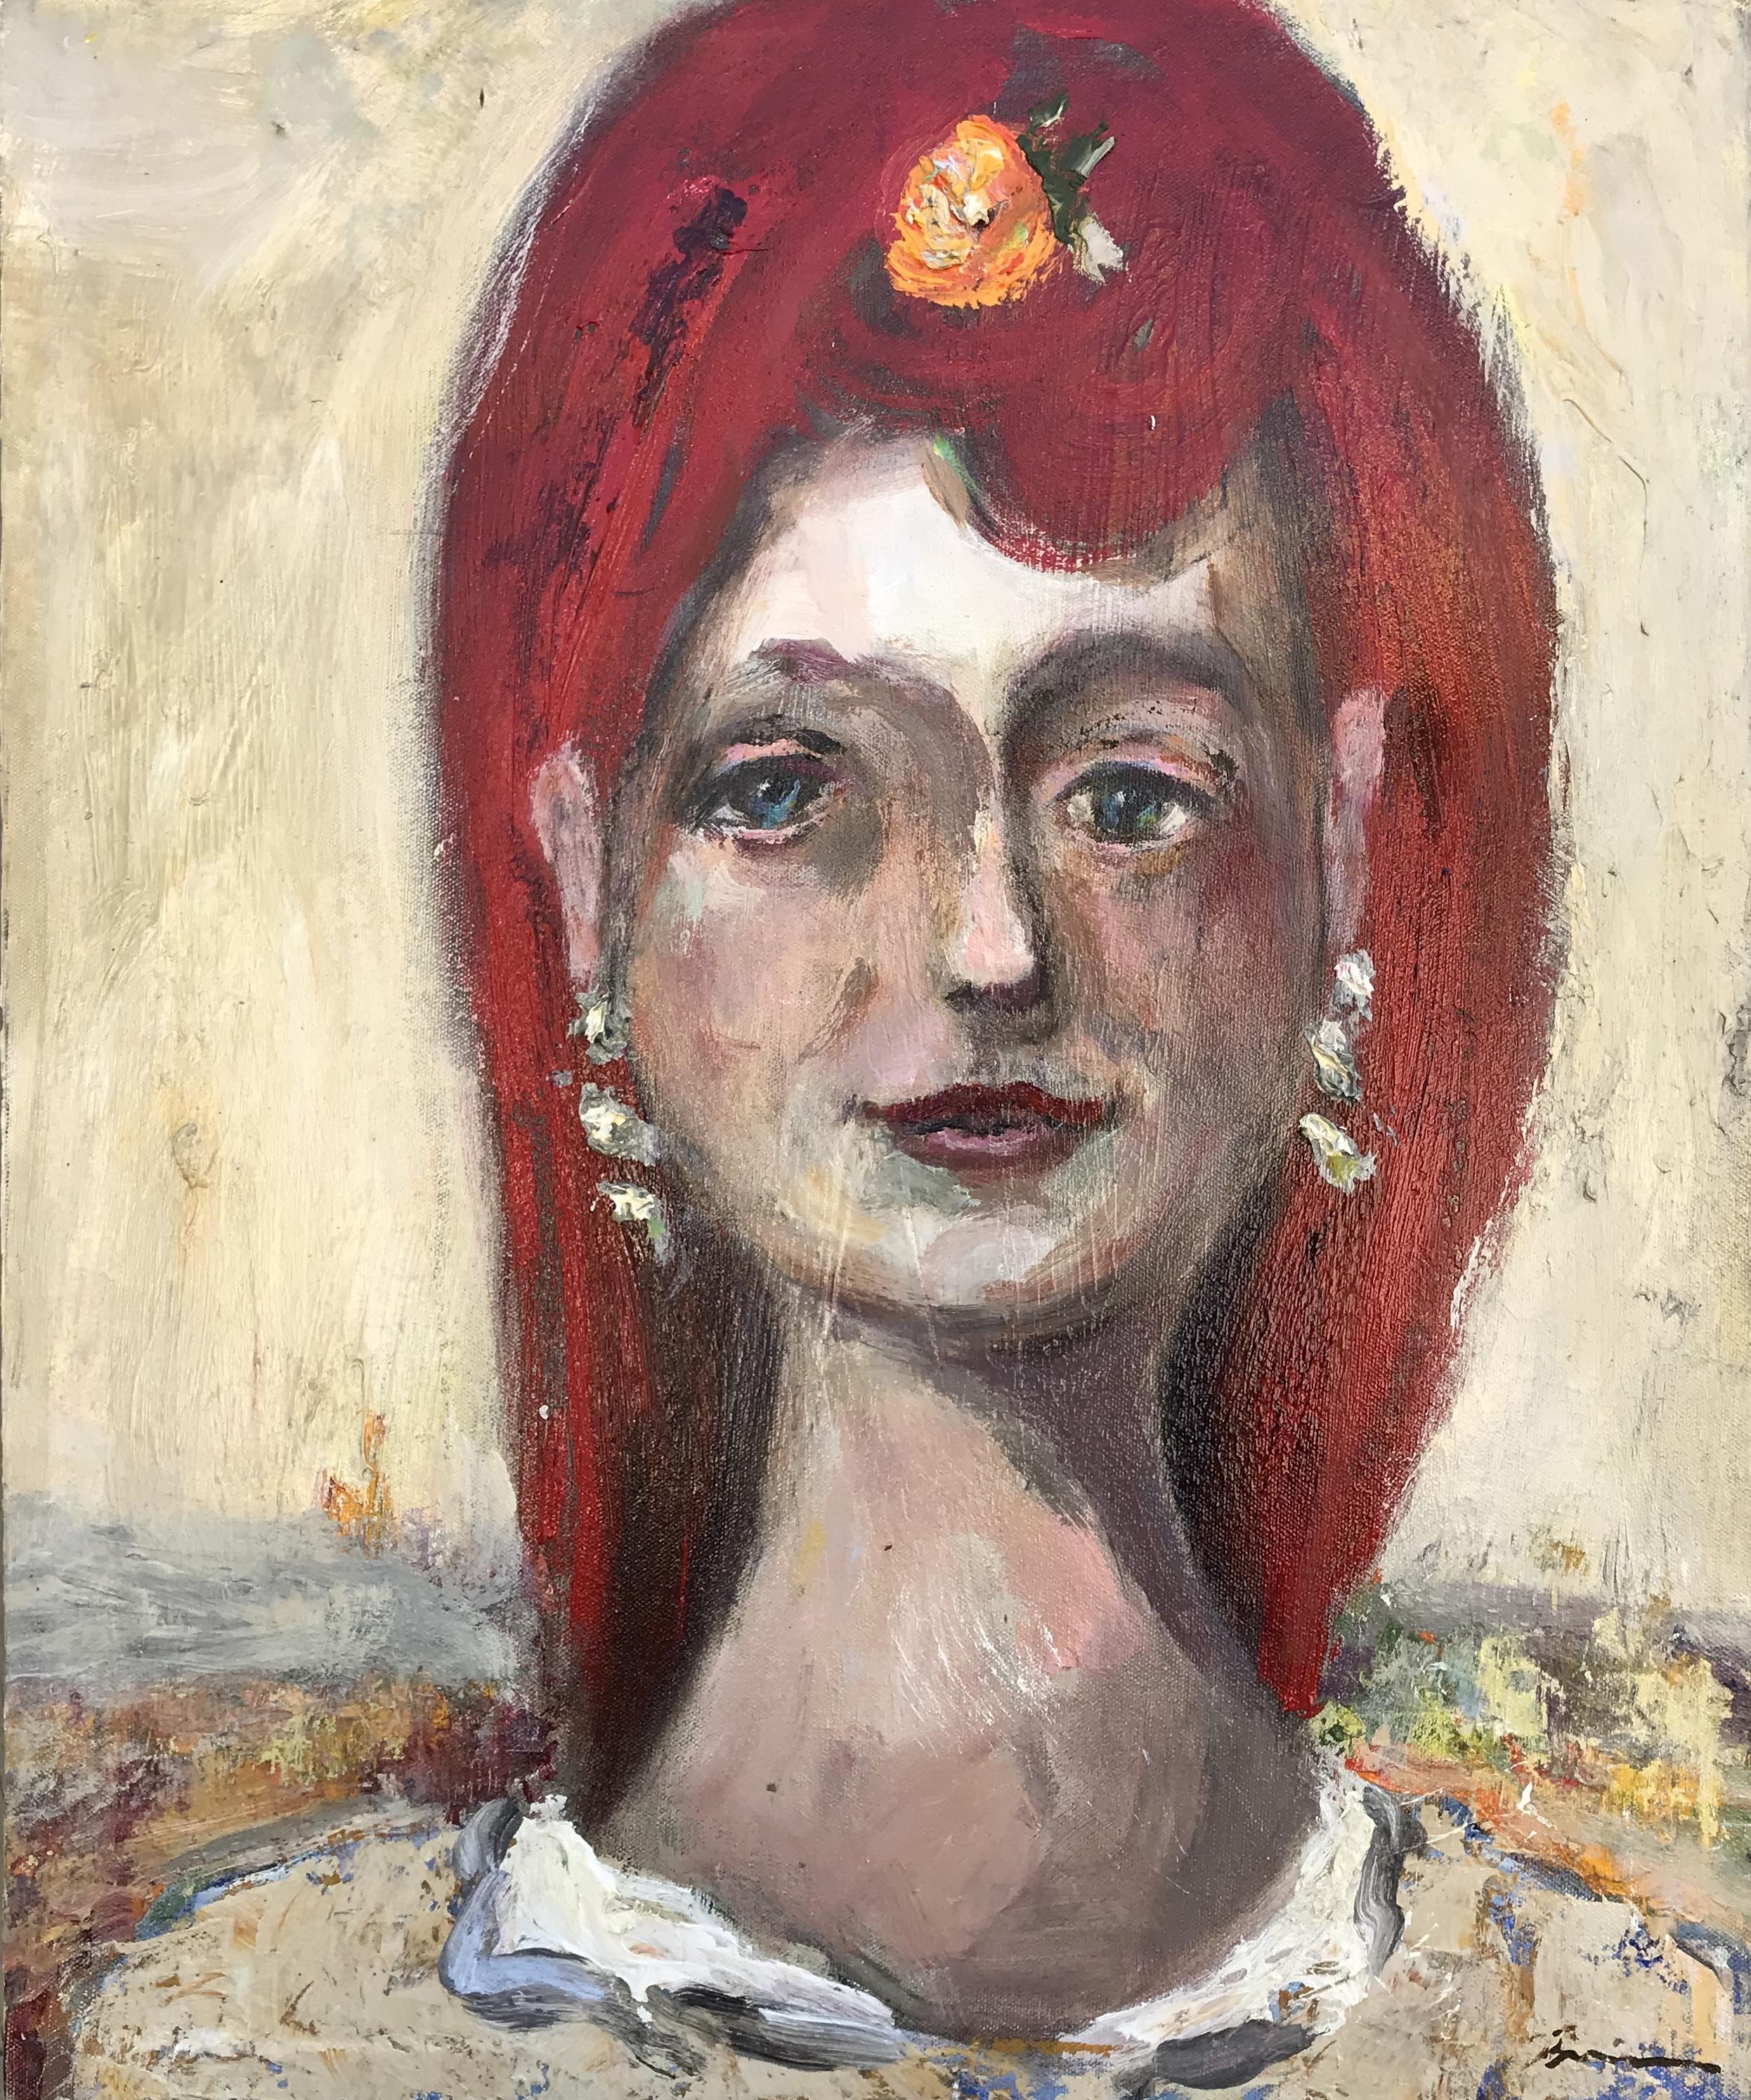 """Frida with the Mandarin"" - 23"" x 19"", oil on canvasValue: $2,150Opening bid: $850email your bid to: art@bradfordbrenner.com"